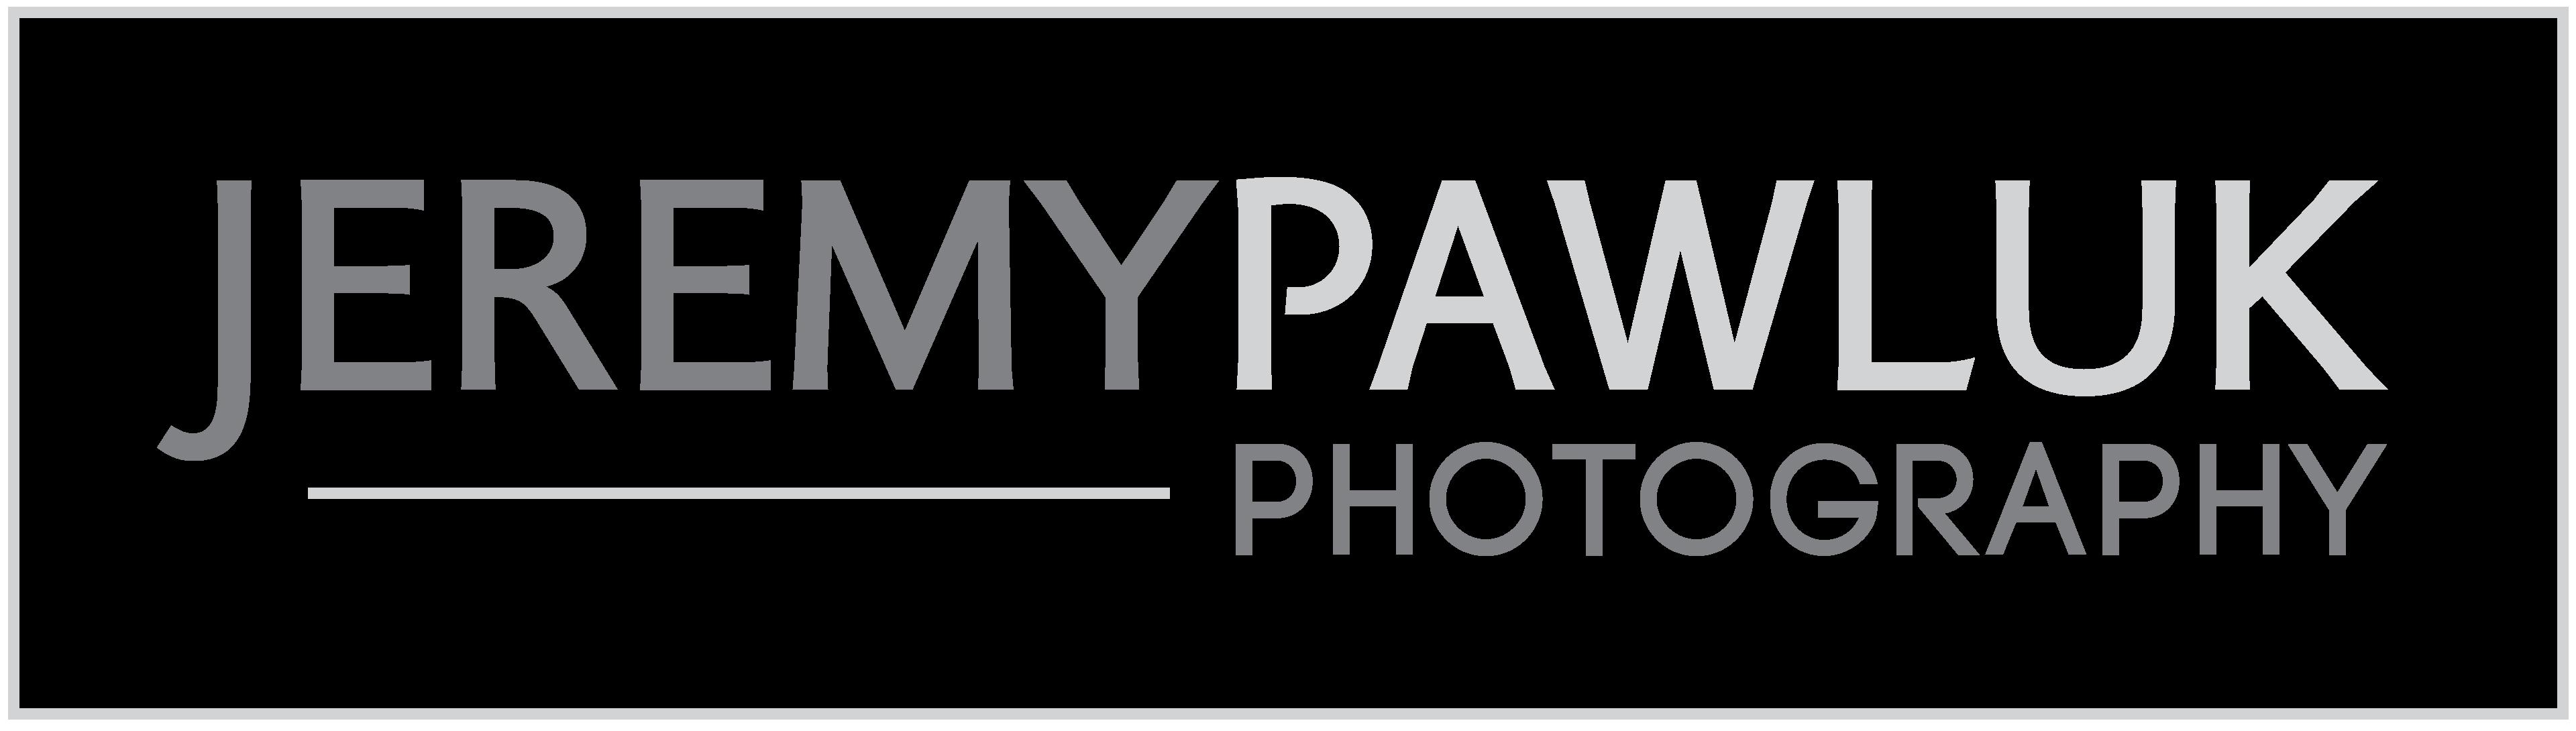 Jeremy Pawluk Photography - Jeremy Pawluk Photography